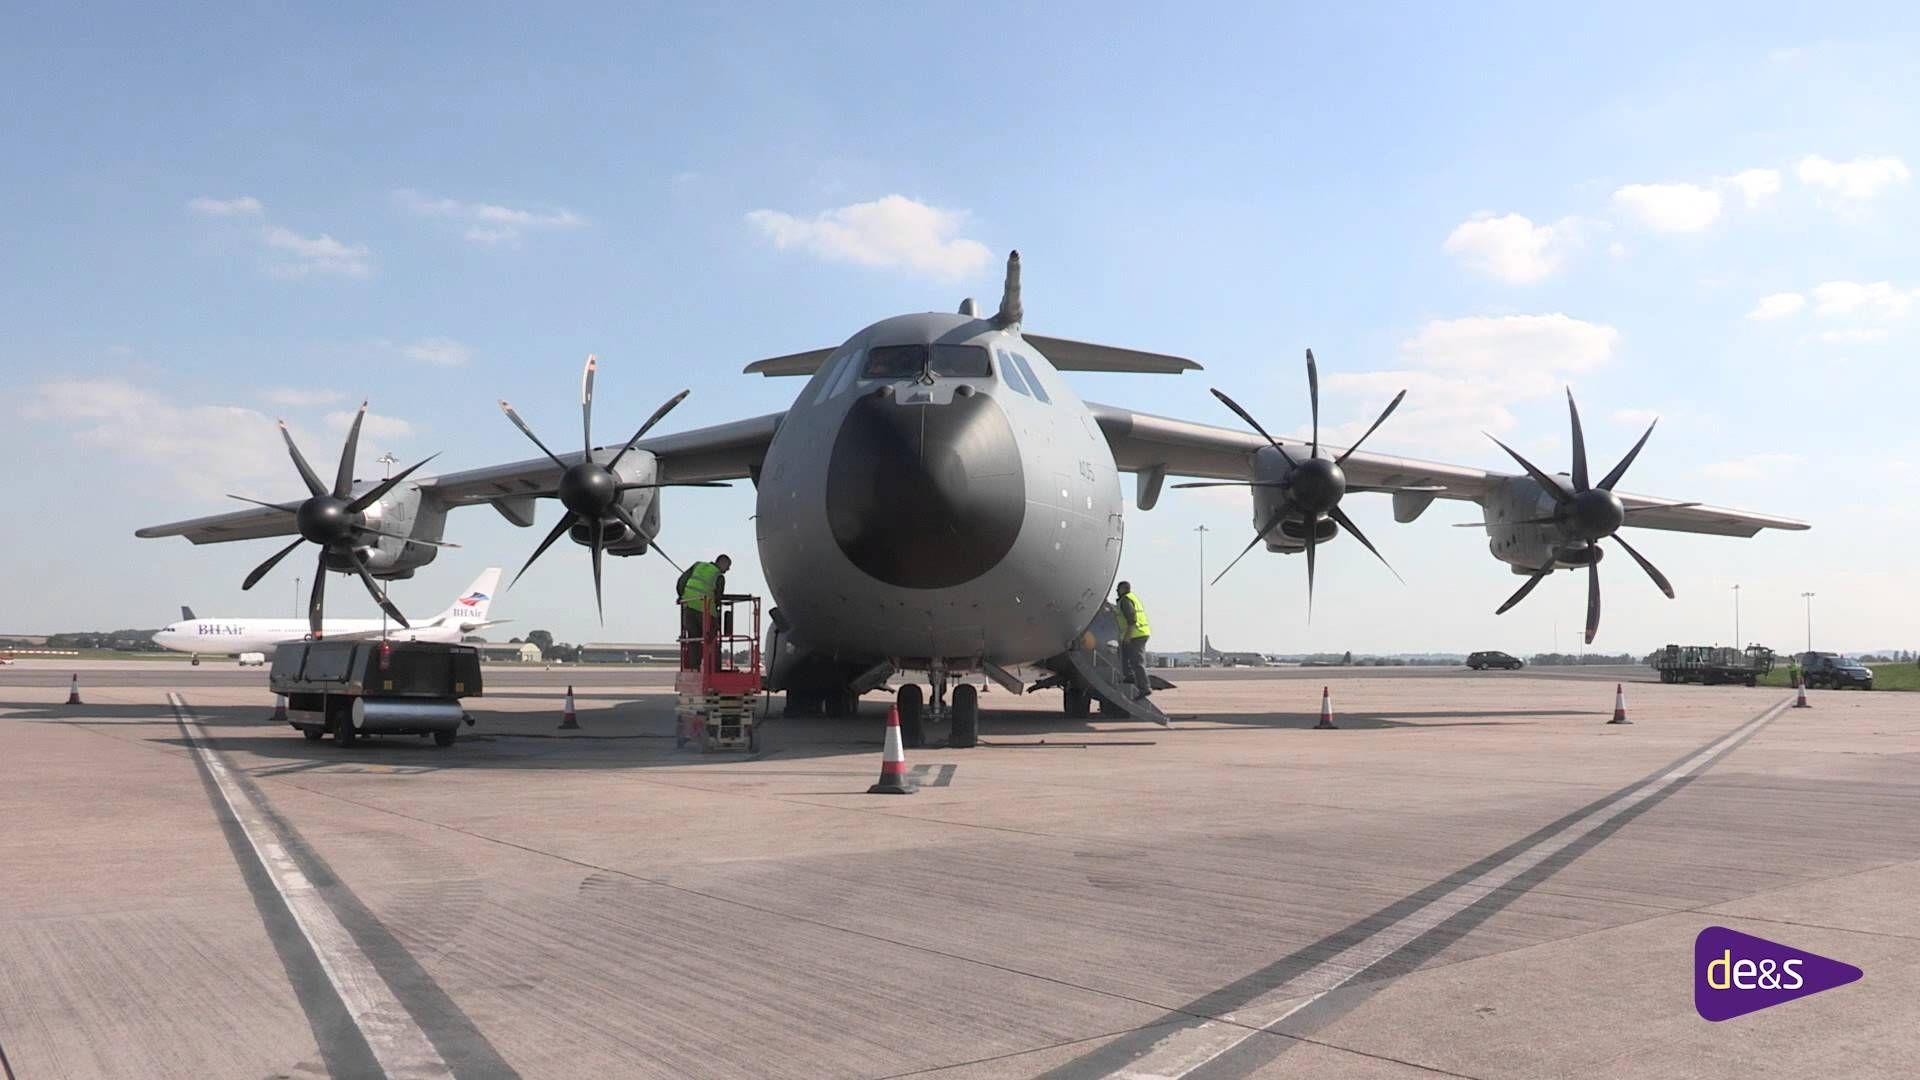 Royal Air Force's transport fleet has reached a key